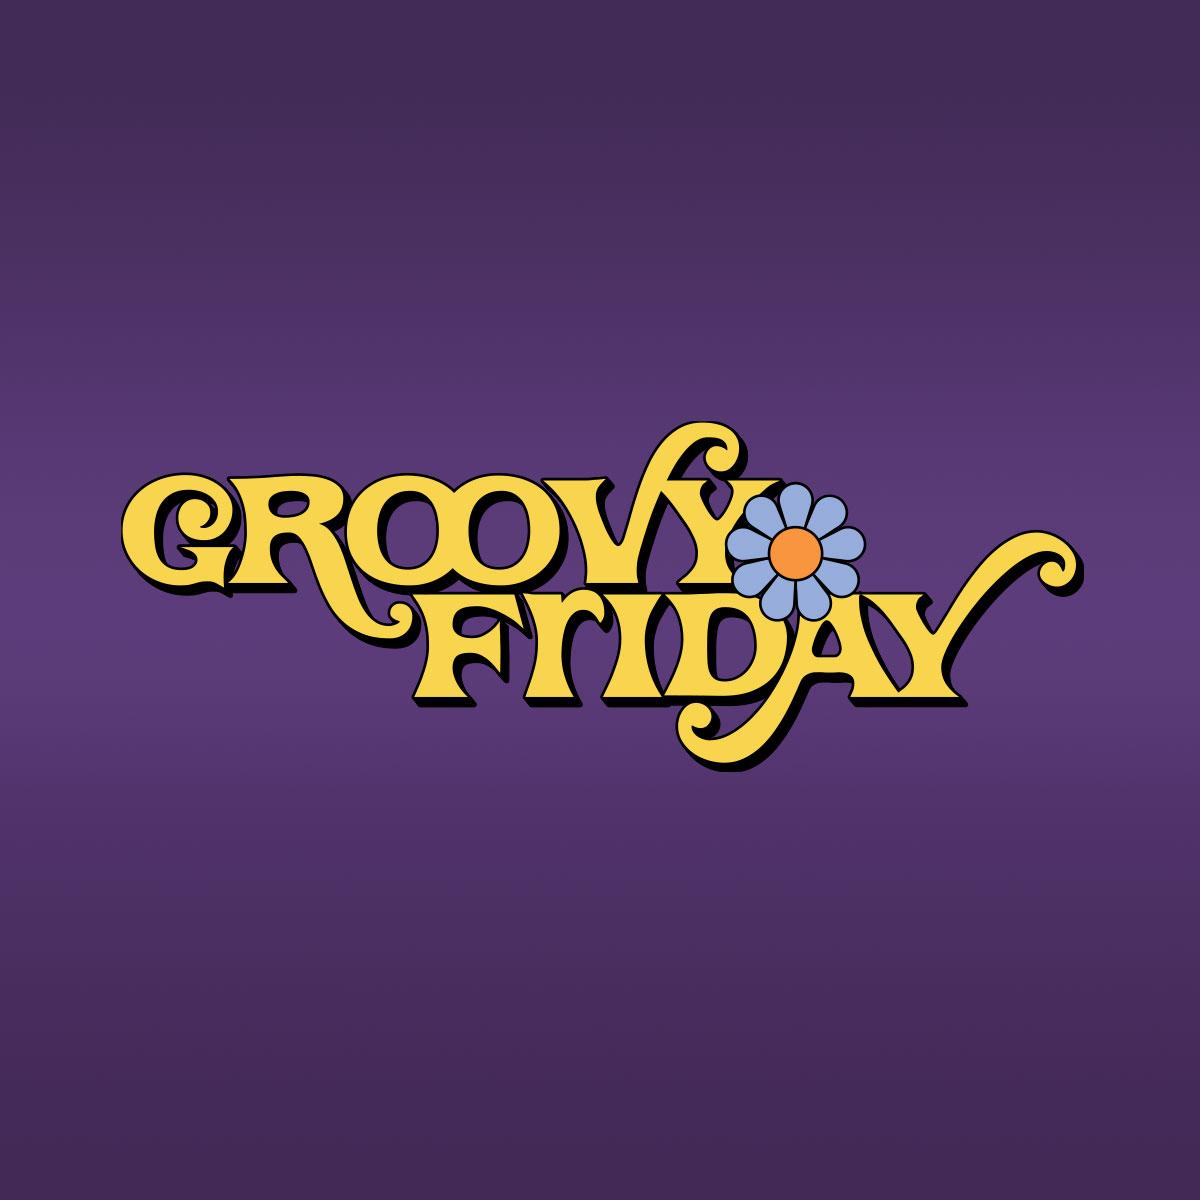 Groovy Friday GIF Gallery